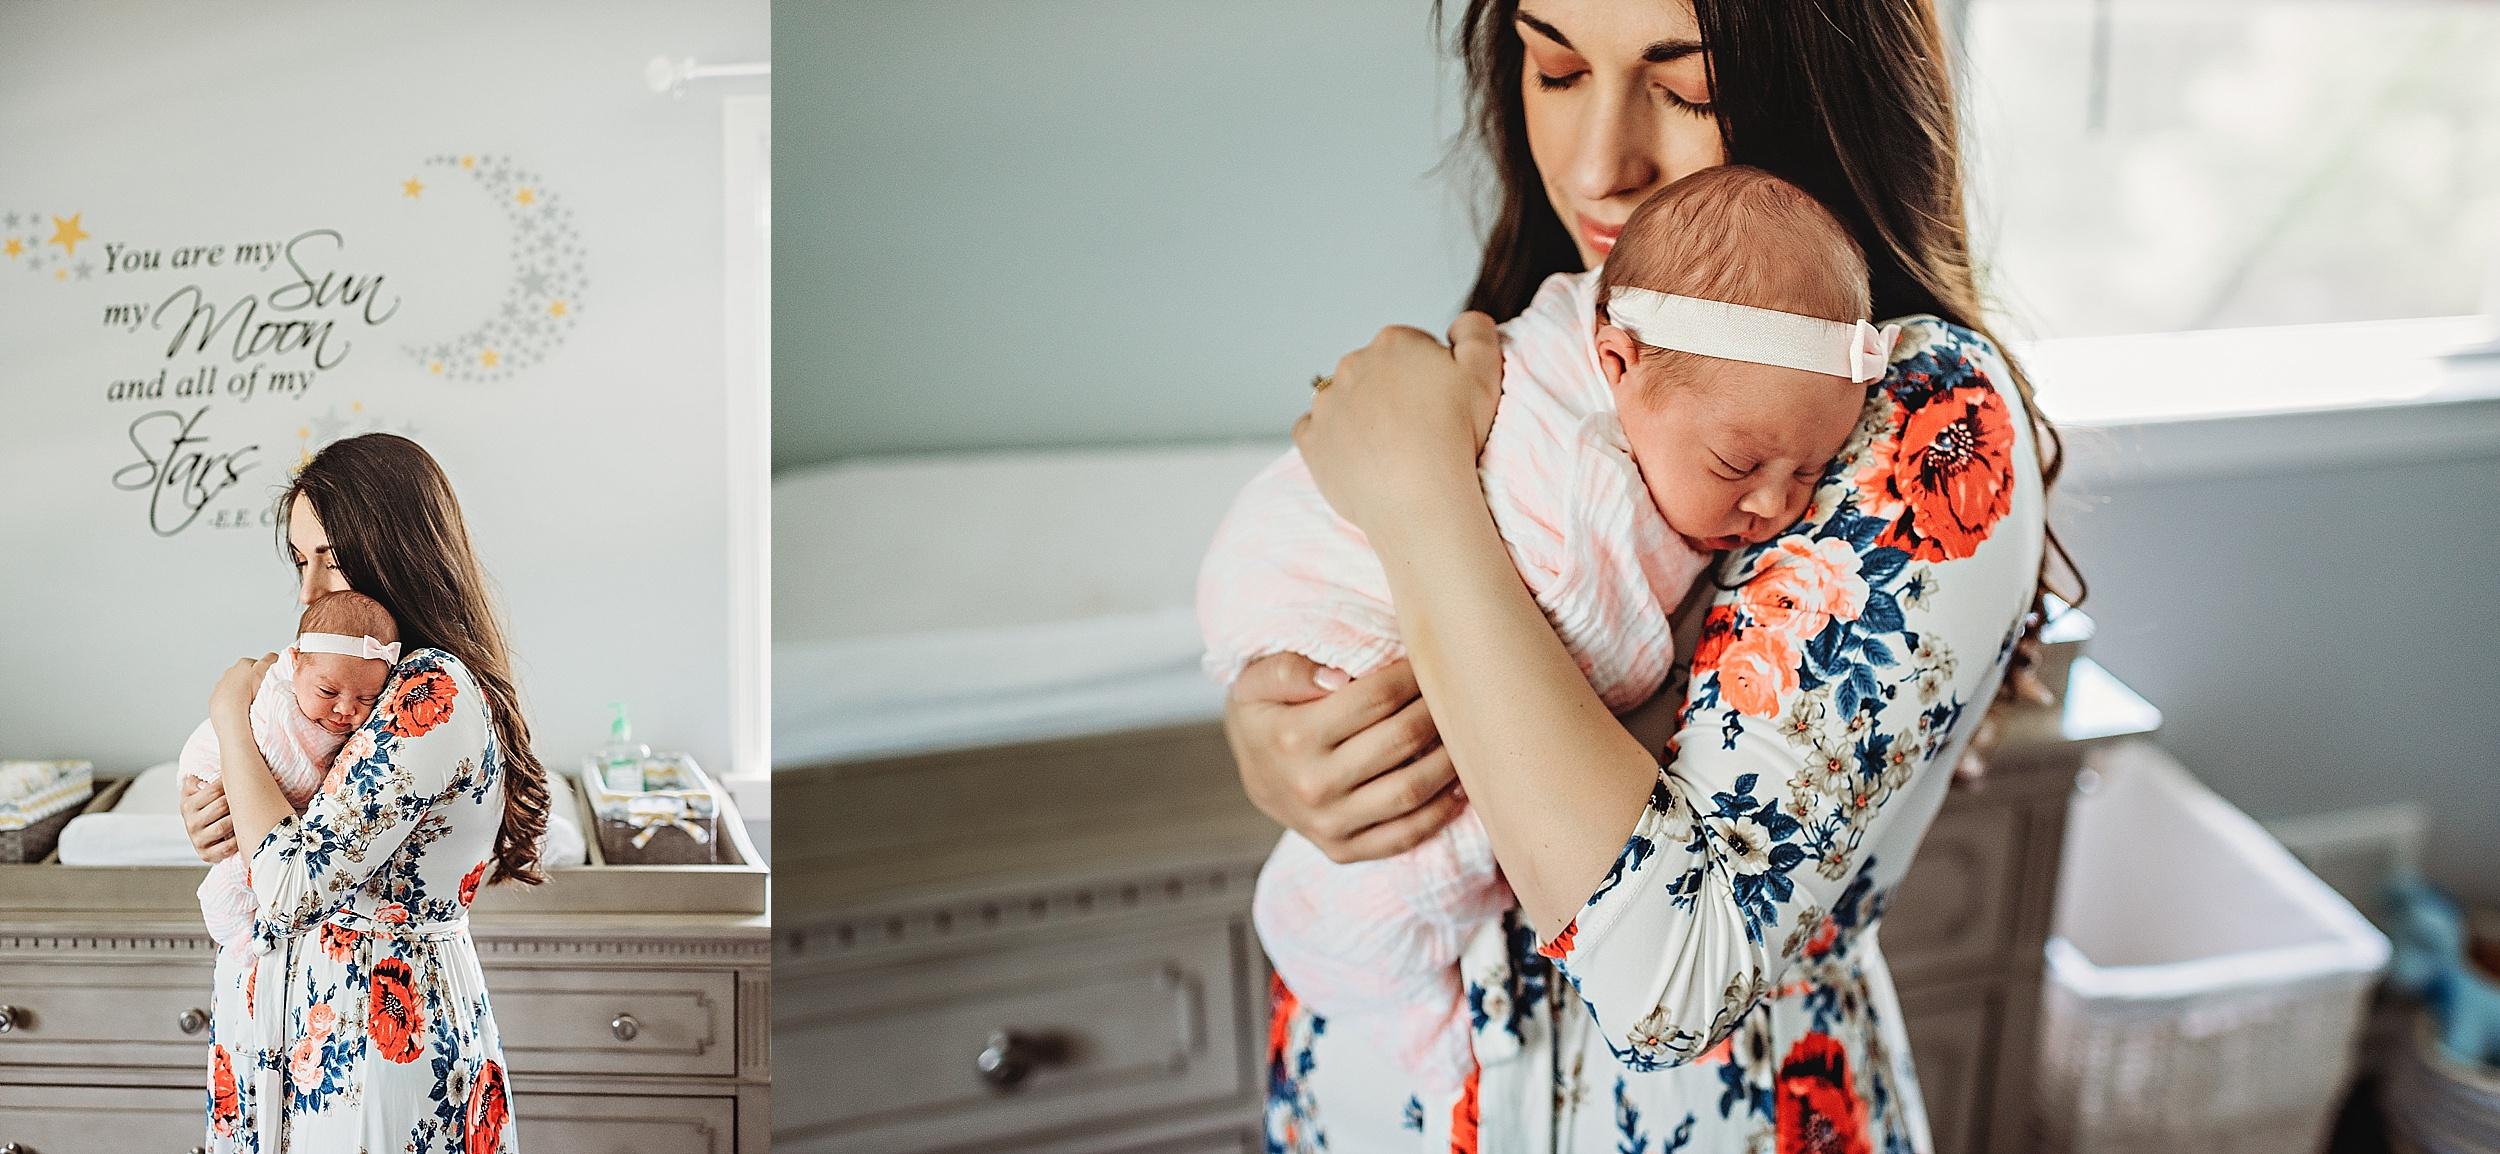 lauren-grayson-photography-akron-cleveland-ohio-photographer-family-newborn-home-photo-session-grace-a_0292.jpg